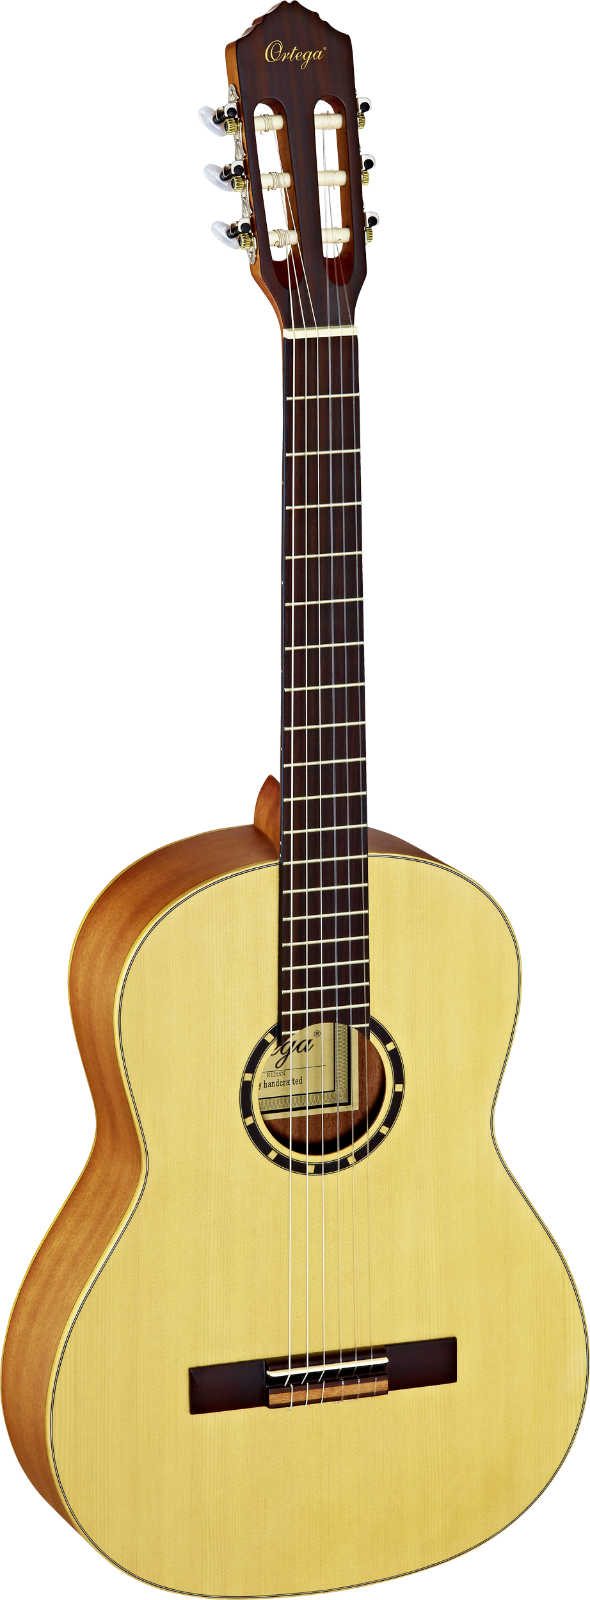 Konzertgitarre 3 4 Schülerinstrument ORTEGA R121-3 4 komplett Set mit GigBag